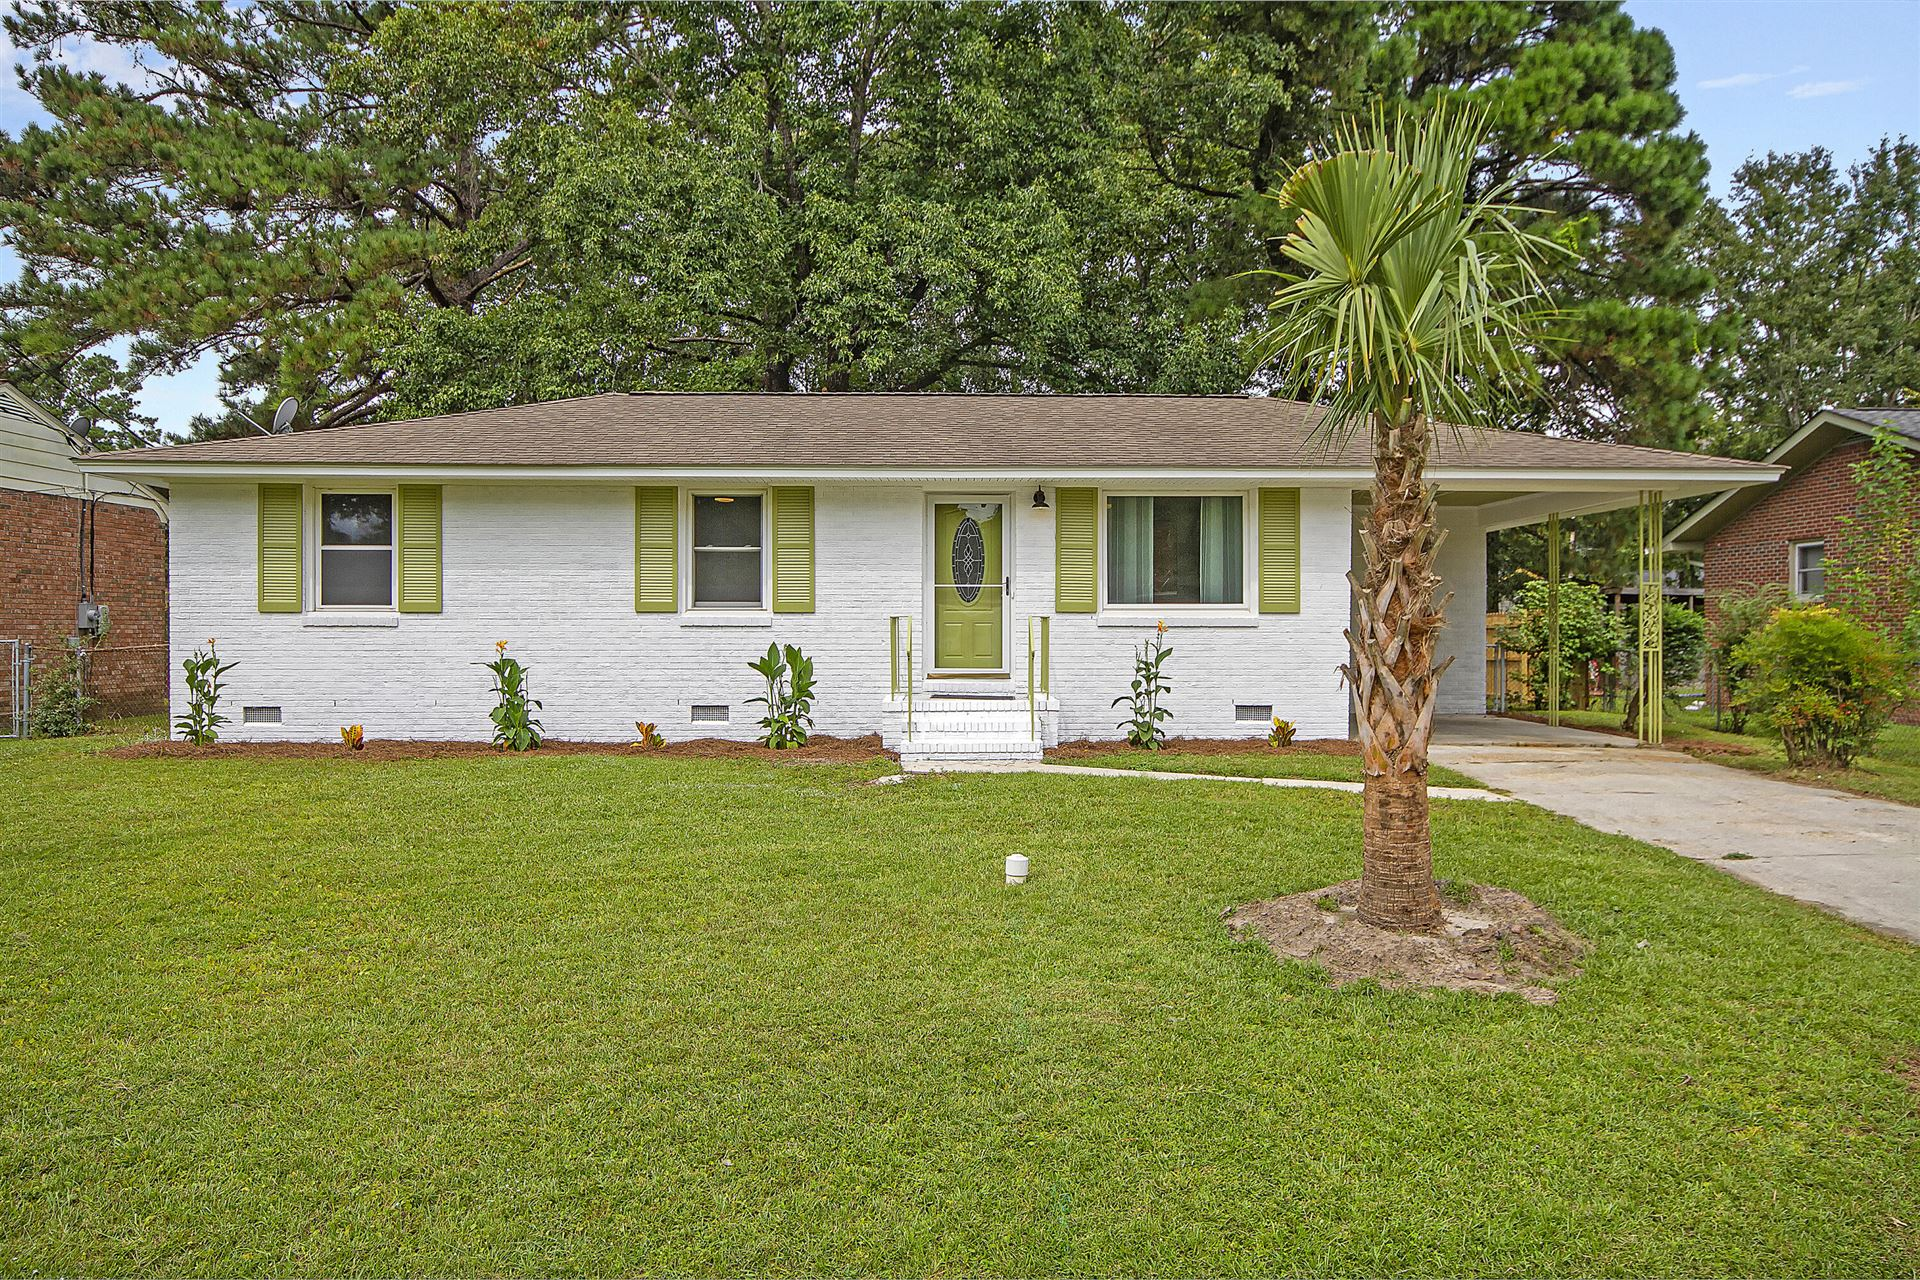 Photo of 831 Cartwright Drive, Charleston, SC 29414 (MLS # 21025566)